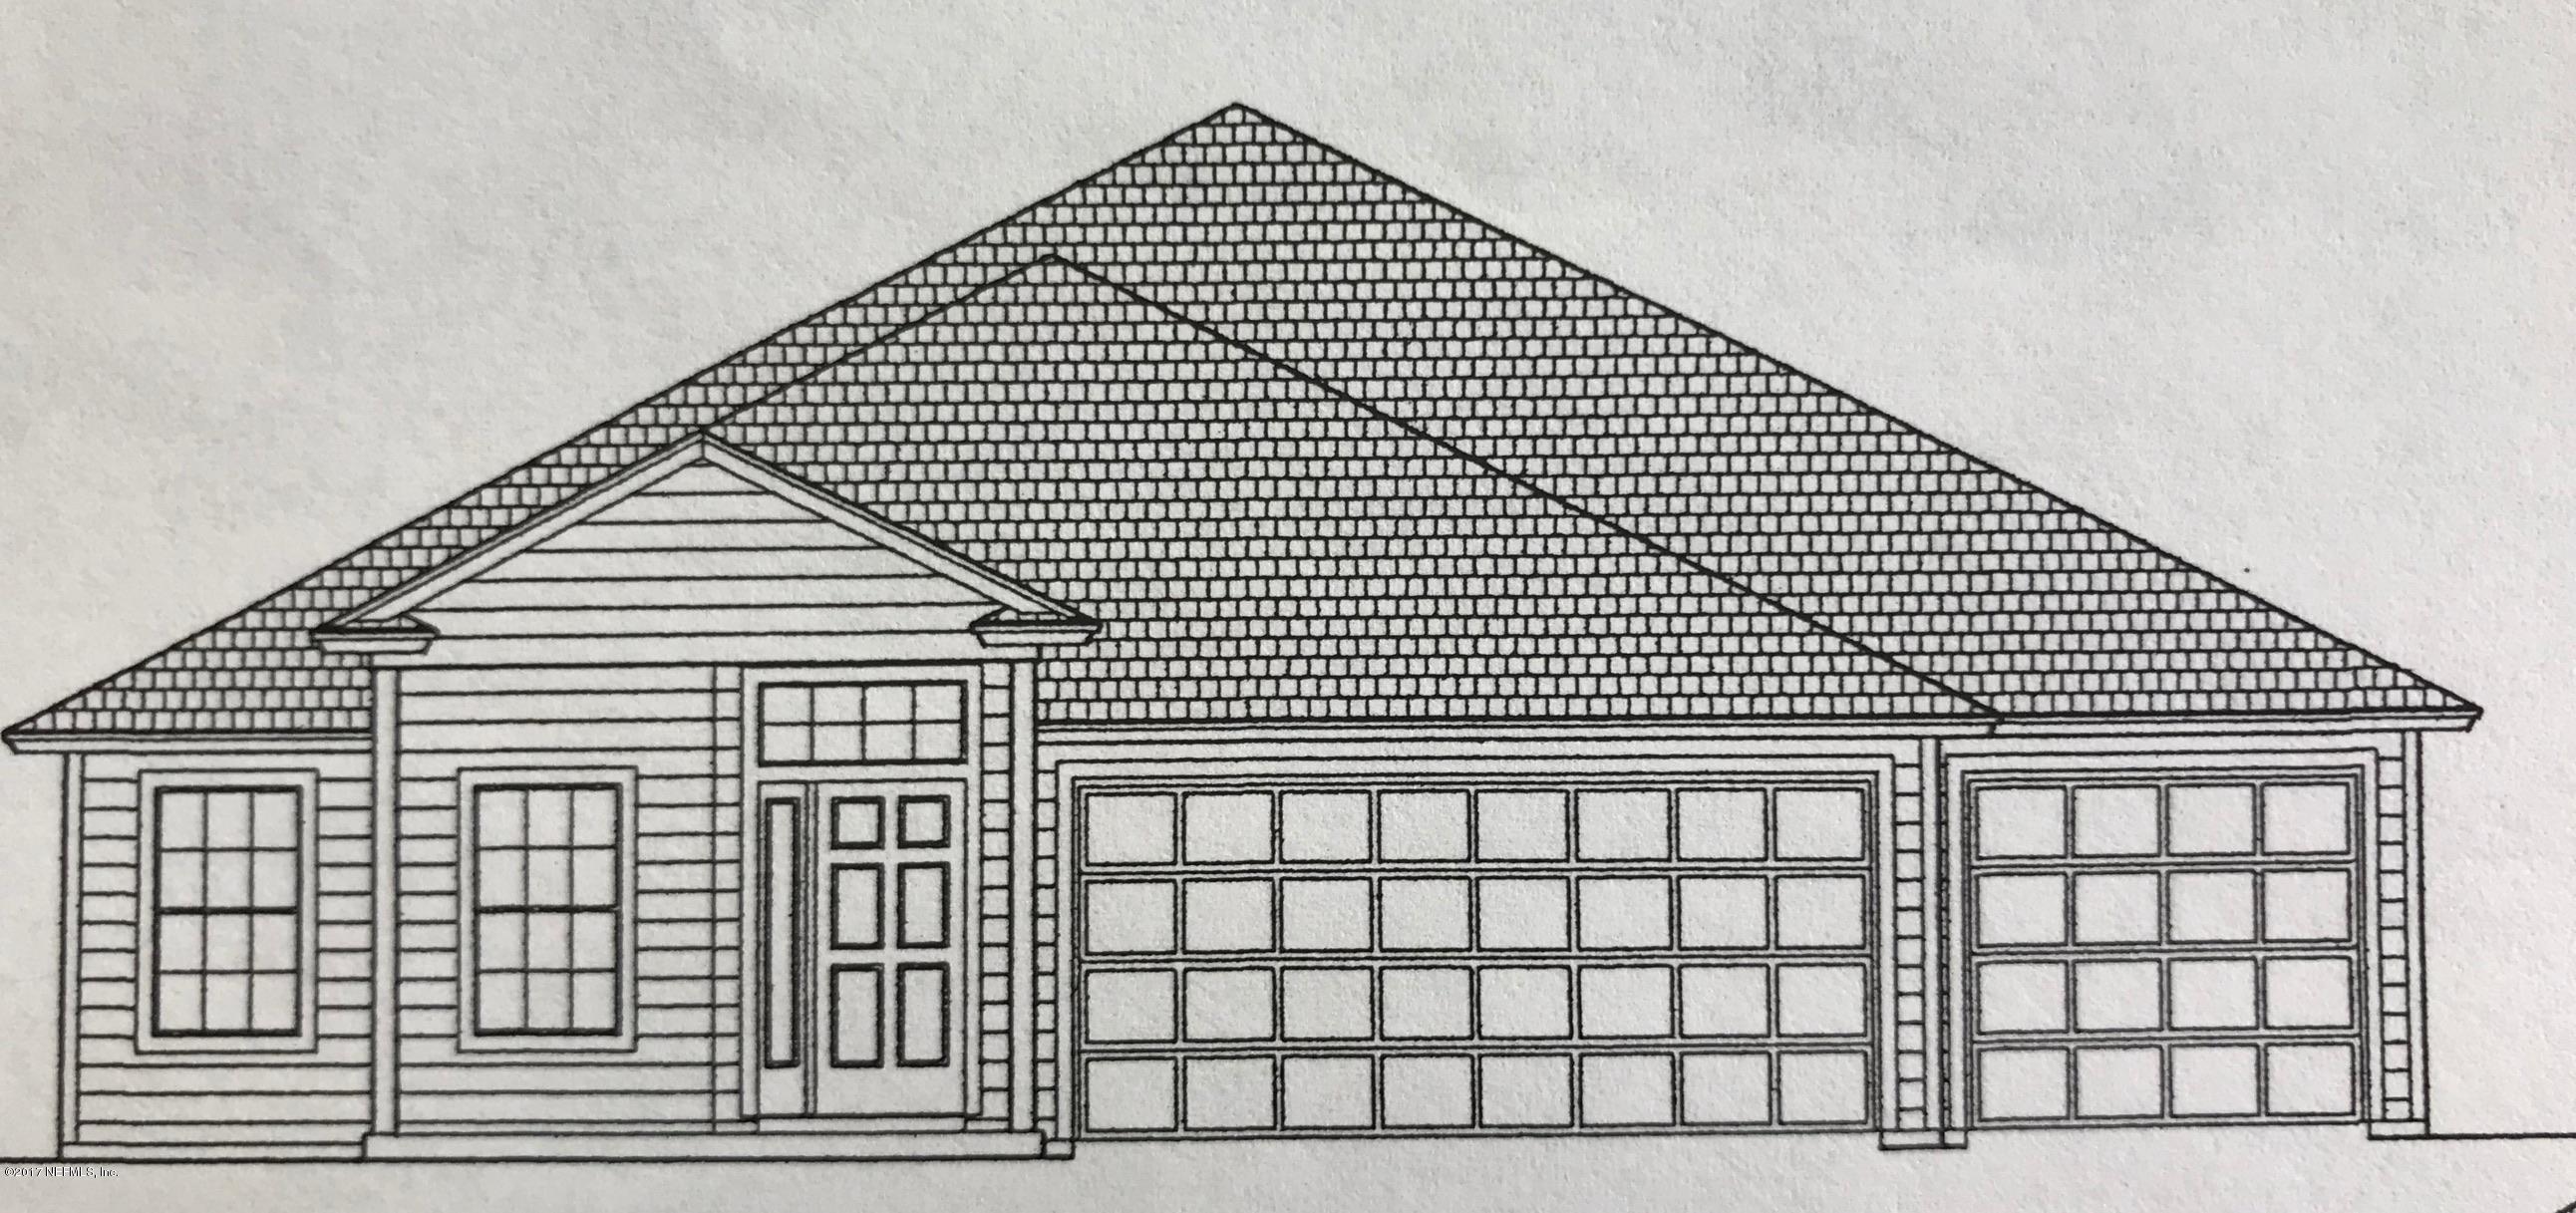 3031 VIANEY, GREEN COVE SPRINGS, FLORIDA 32043, 4 Bedrooms Bedrooms, ,3 BathroomsBathrooms,Residential - single family,For sale,VIANEY,964372